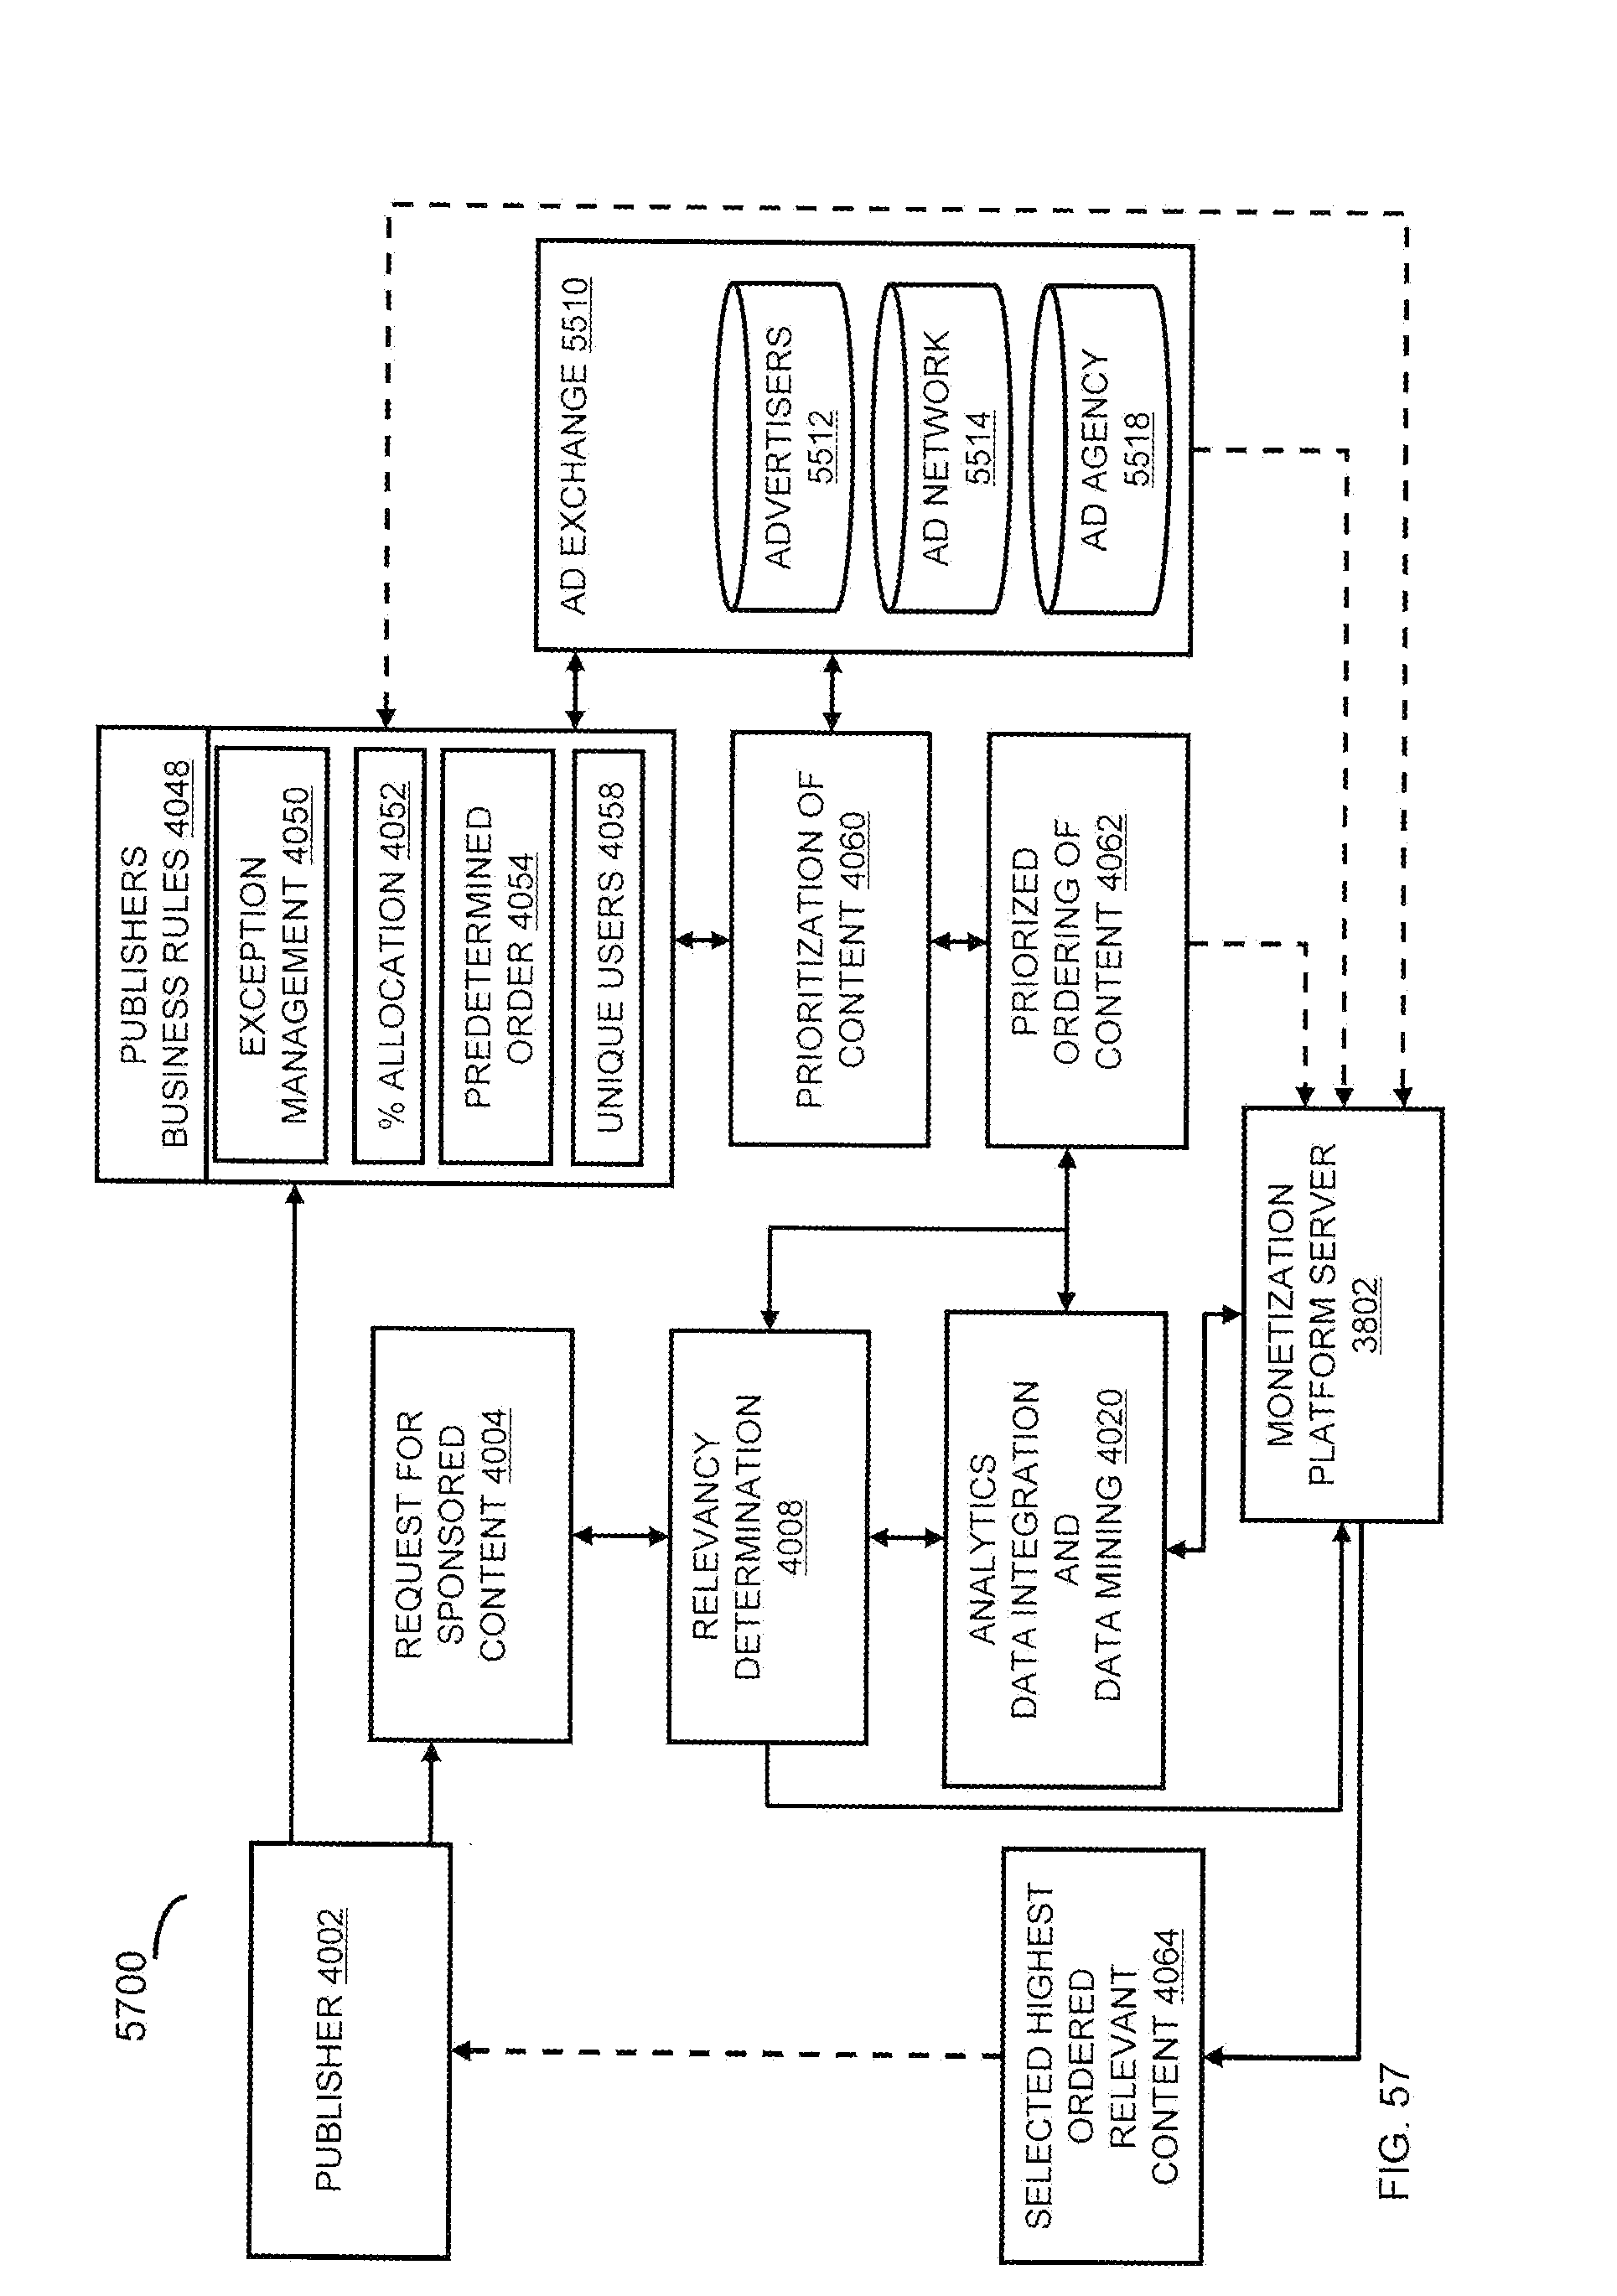 Patent US 20110258049A1